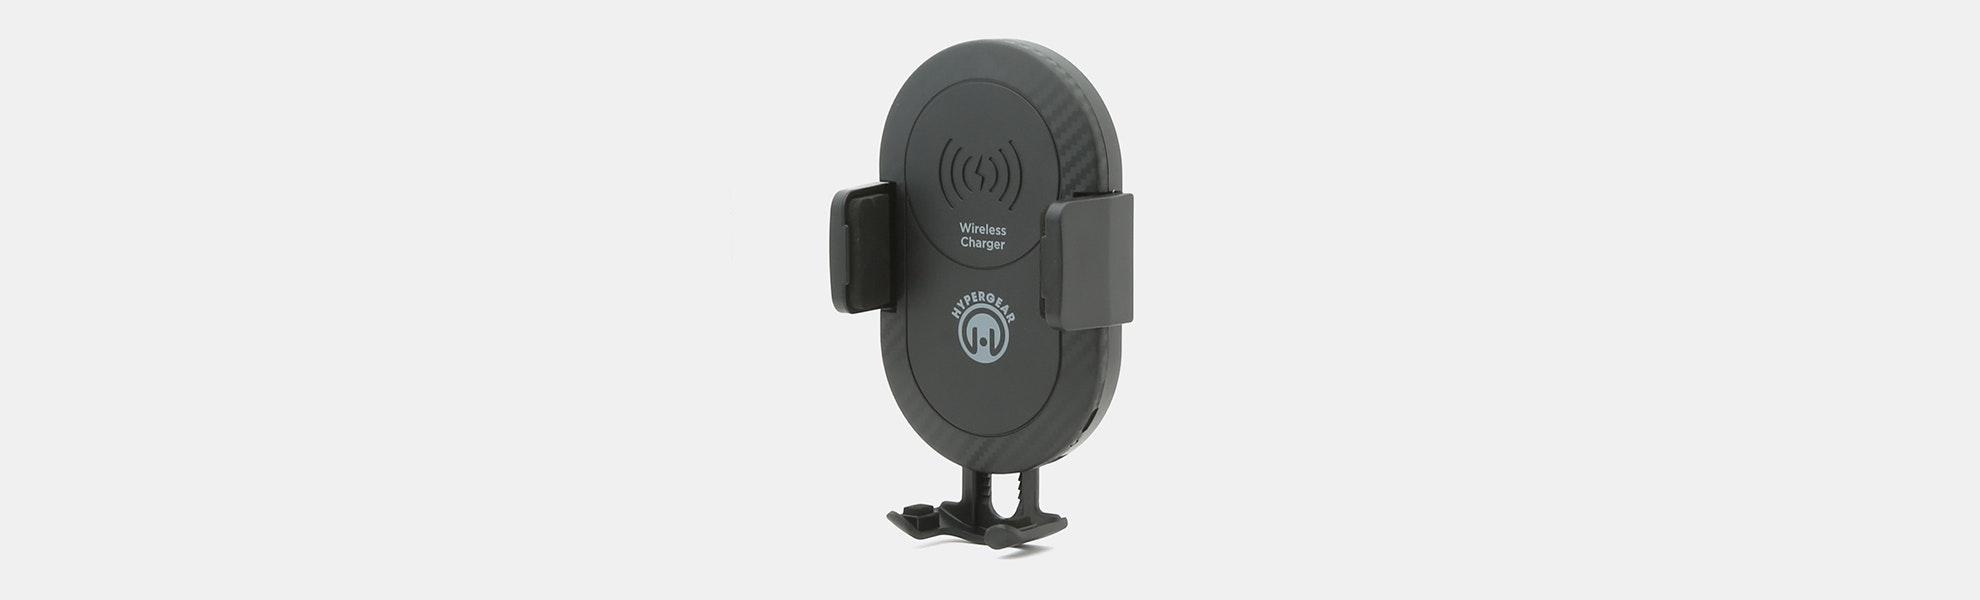 HyperGear Wireless Charging Vent Mounts